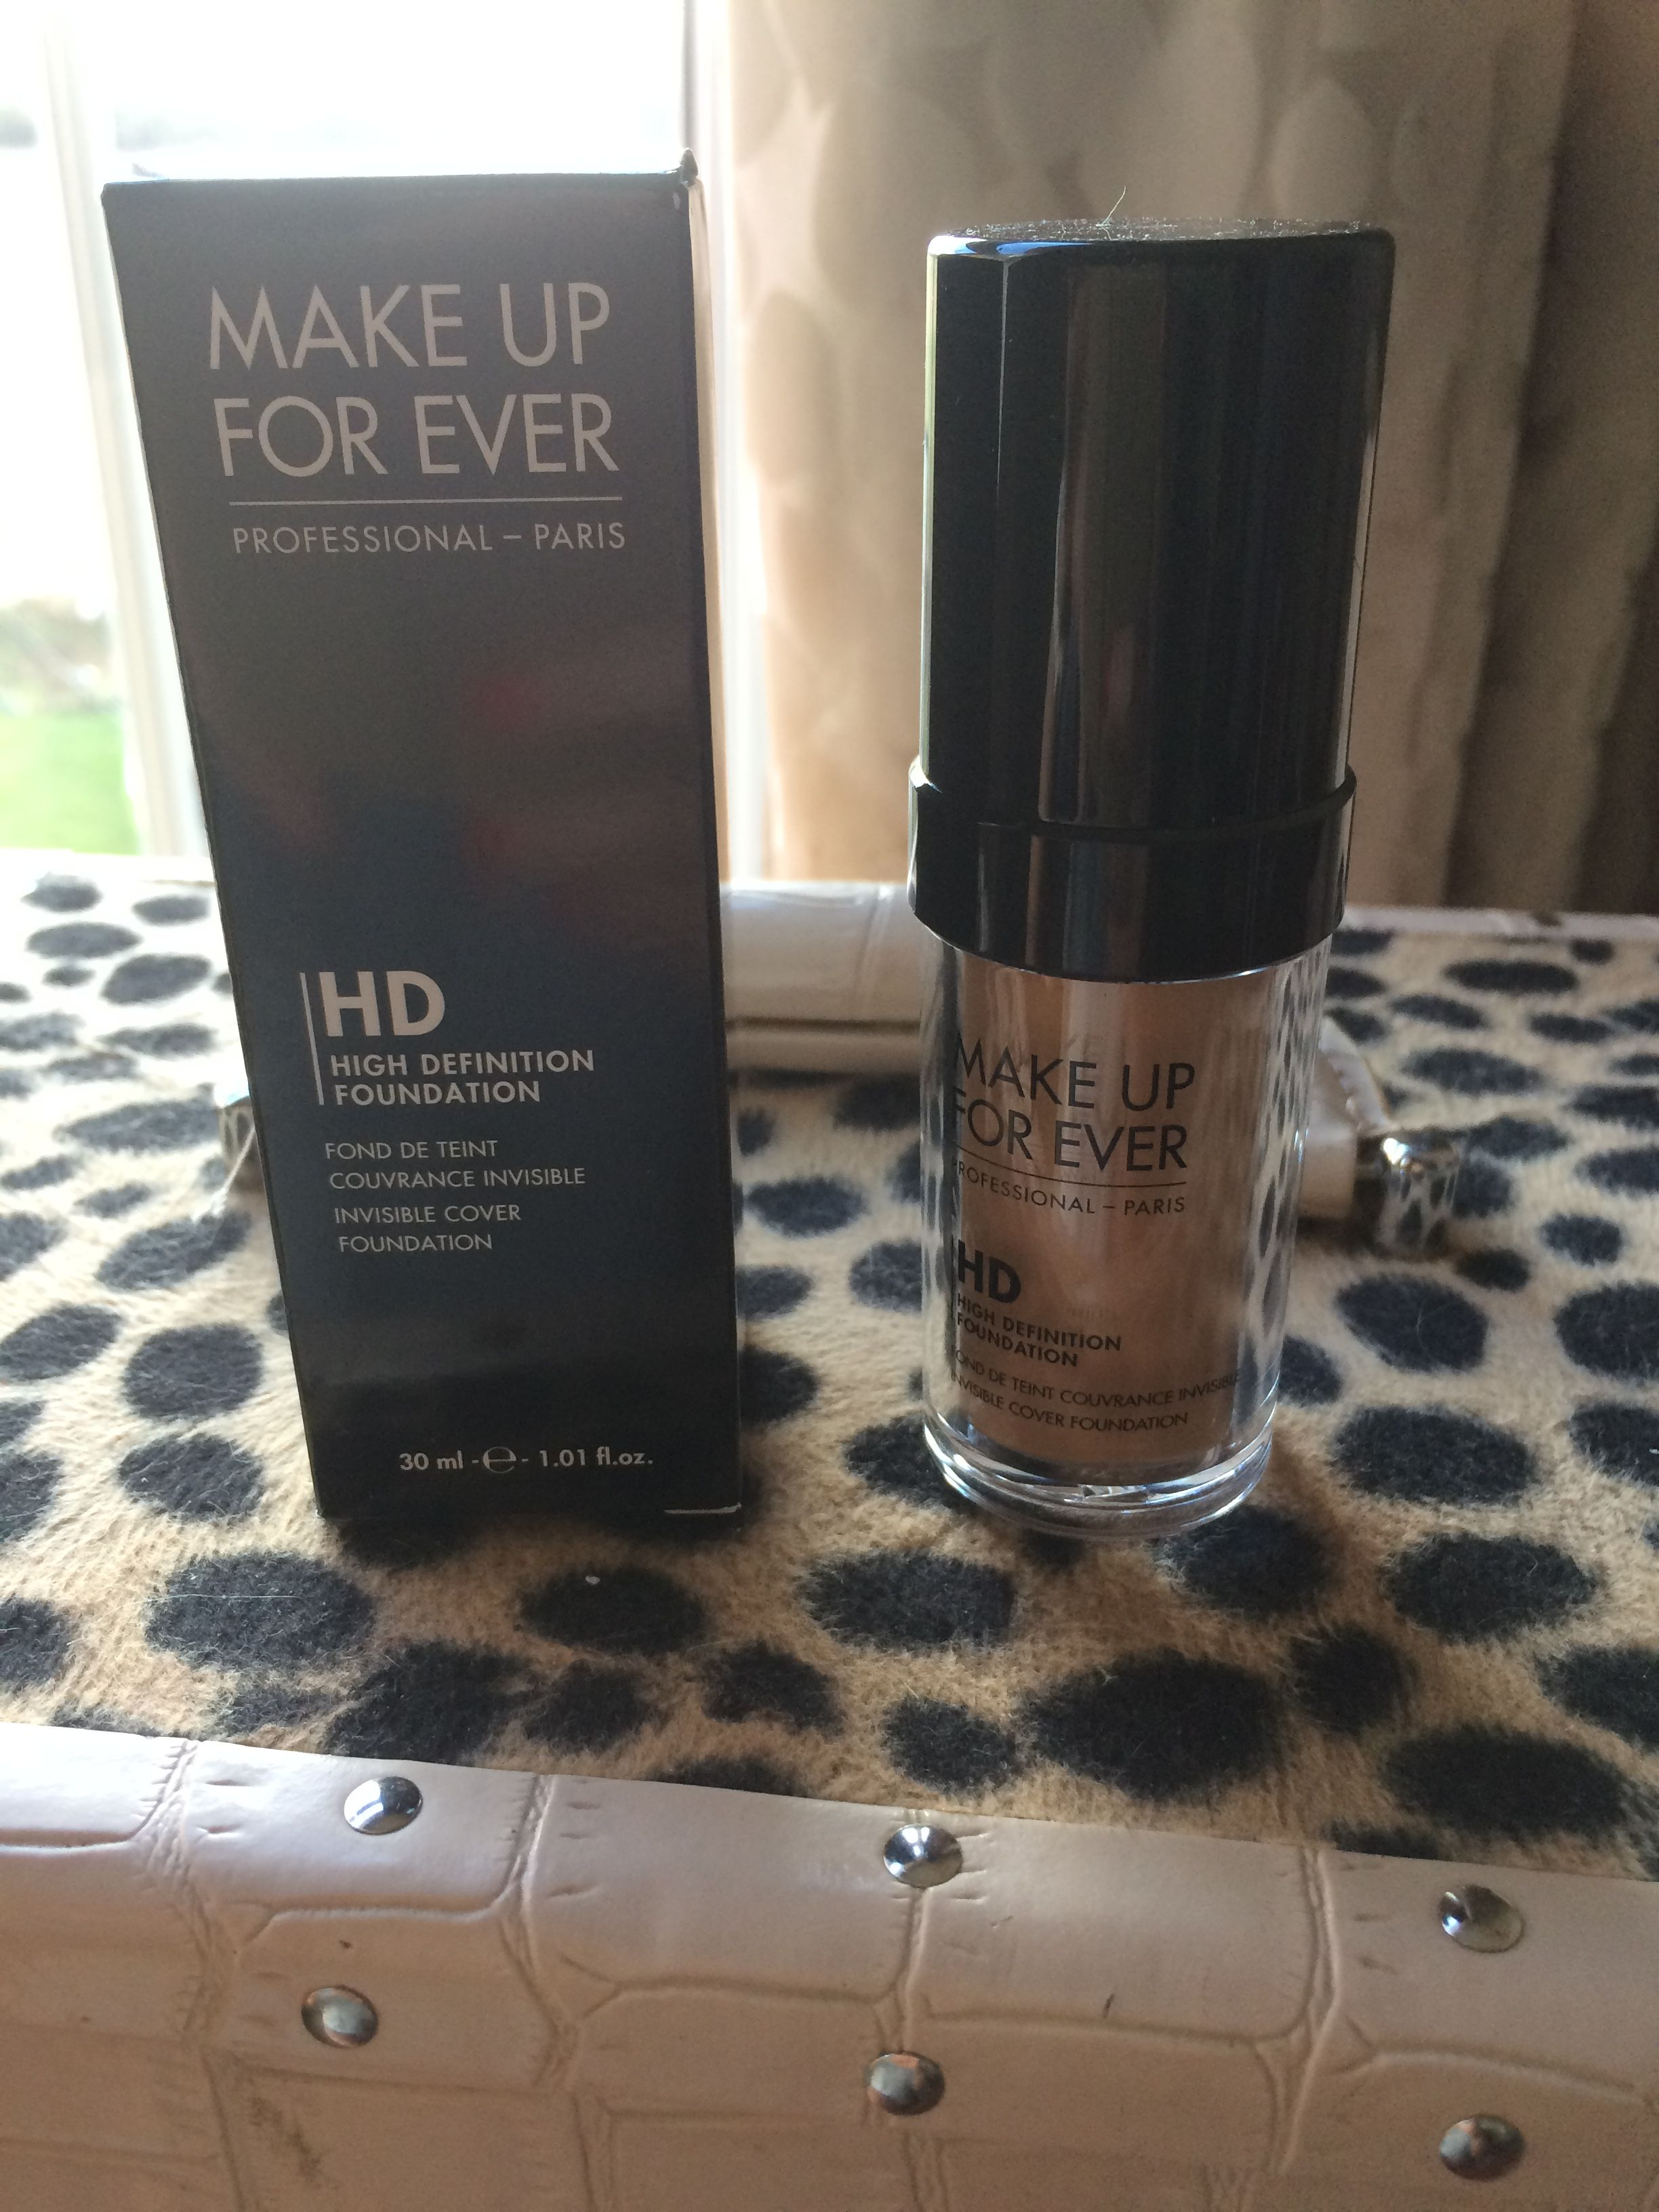 Makeup forever HD foundation shade 123. Best foundation I